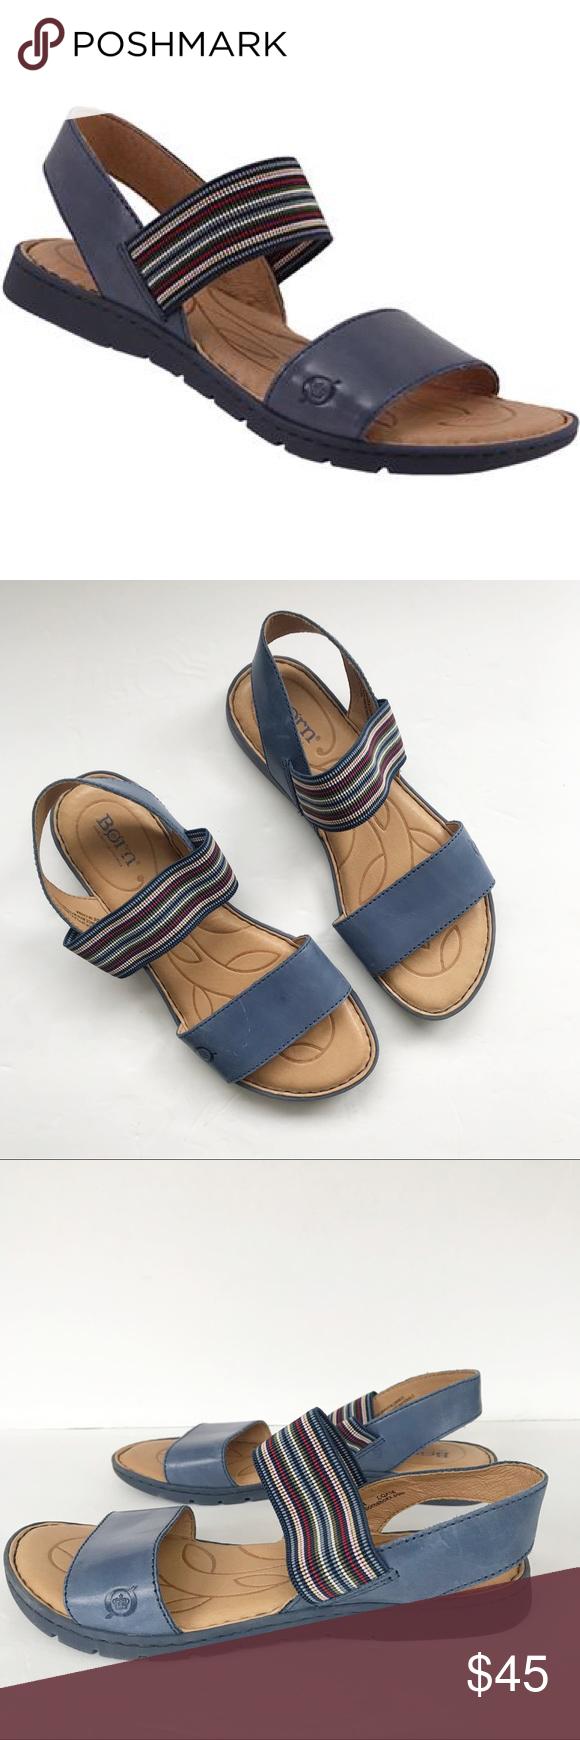 82b68735a429 Born Parson Blue Ankle Strap Sandal Sz. 8M Born Parson blue ankle strap  sandals in